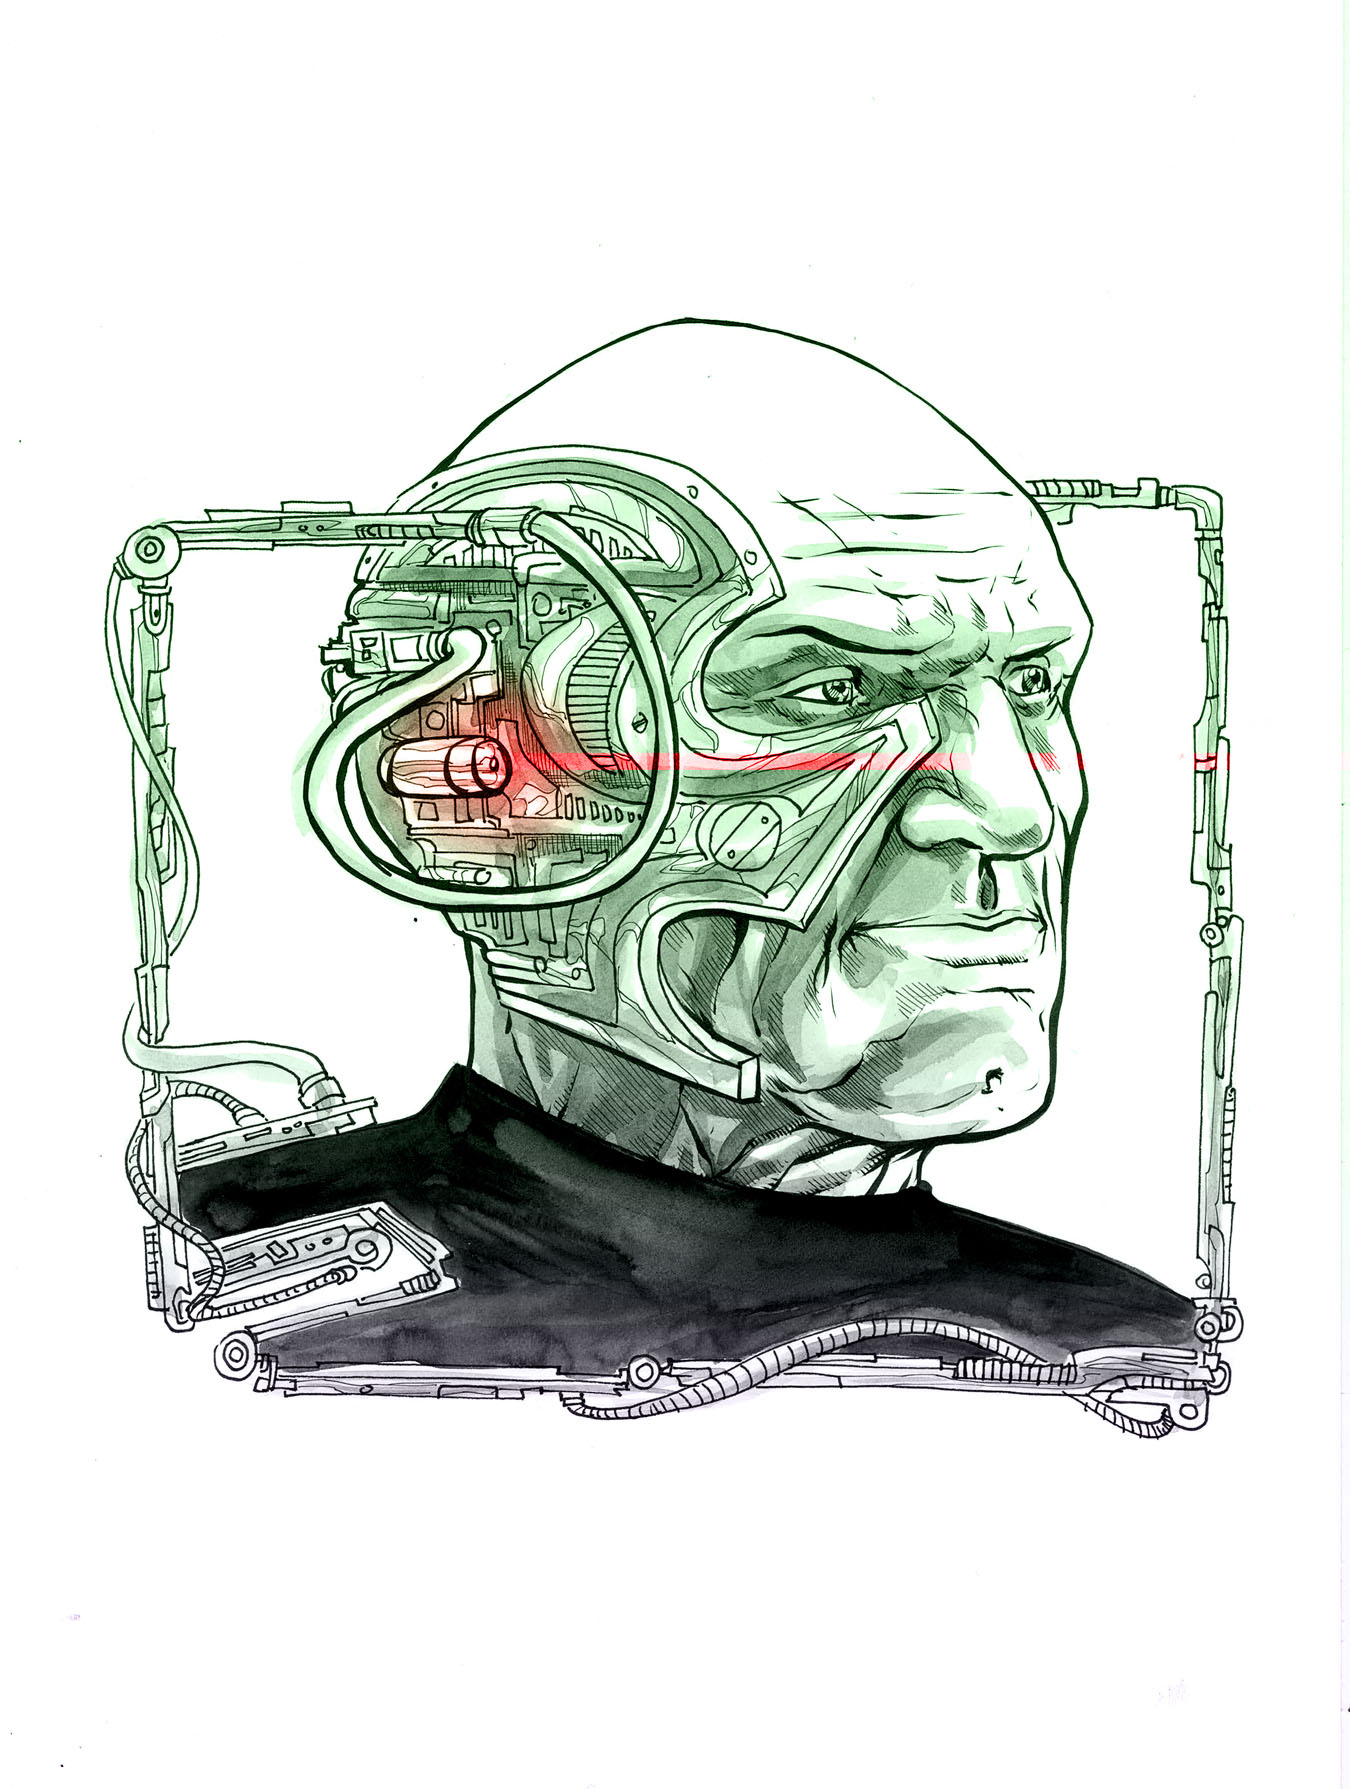 Locutus of Borg PH by thecreatorhd